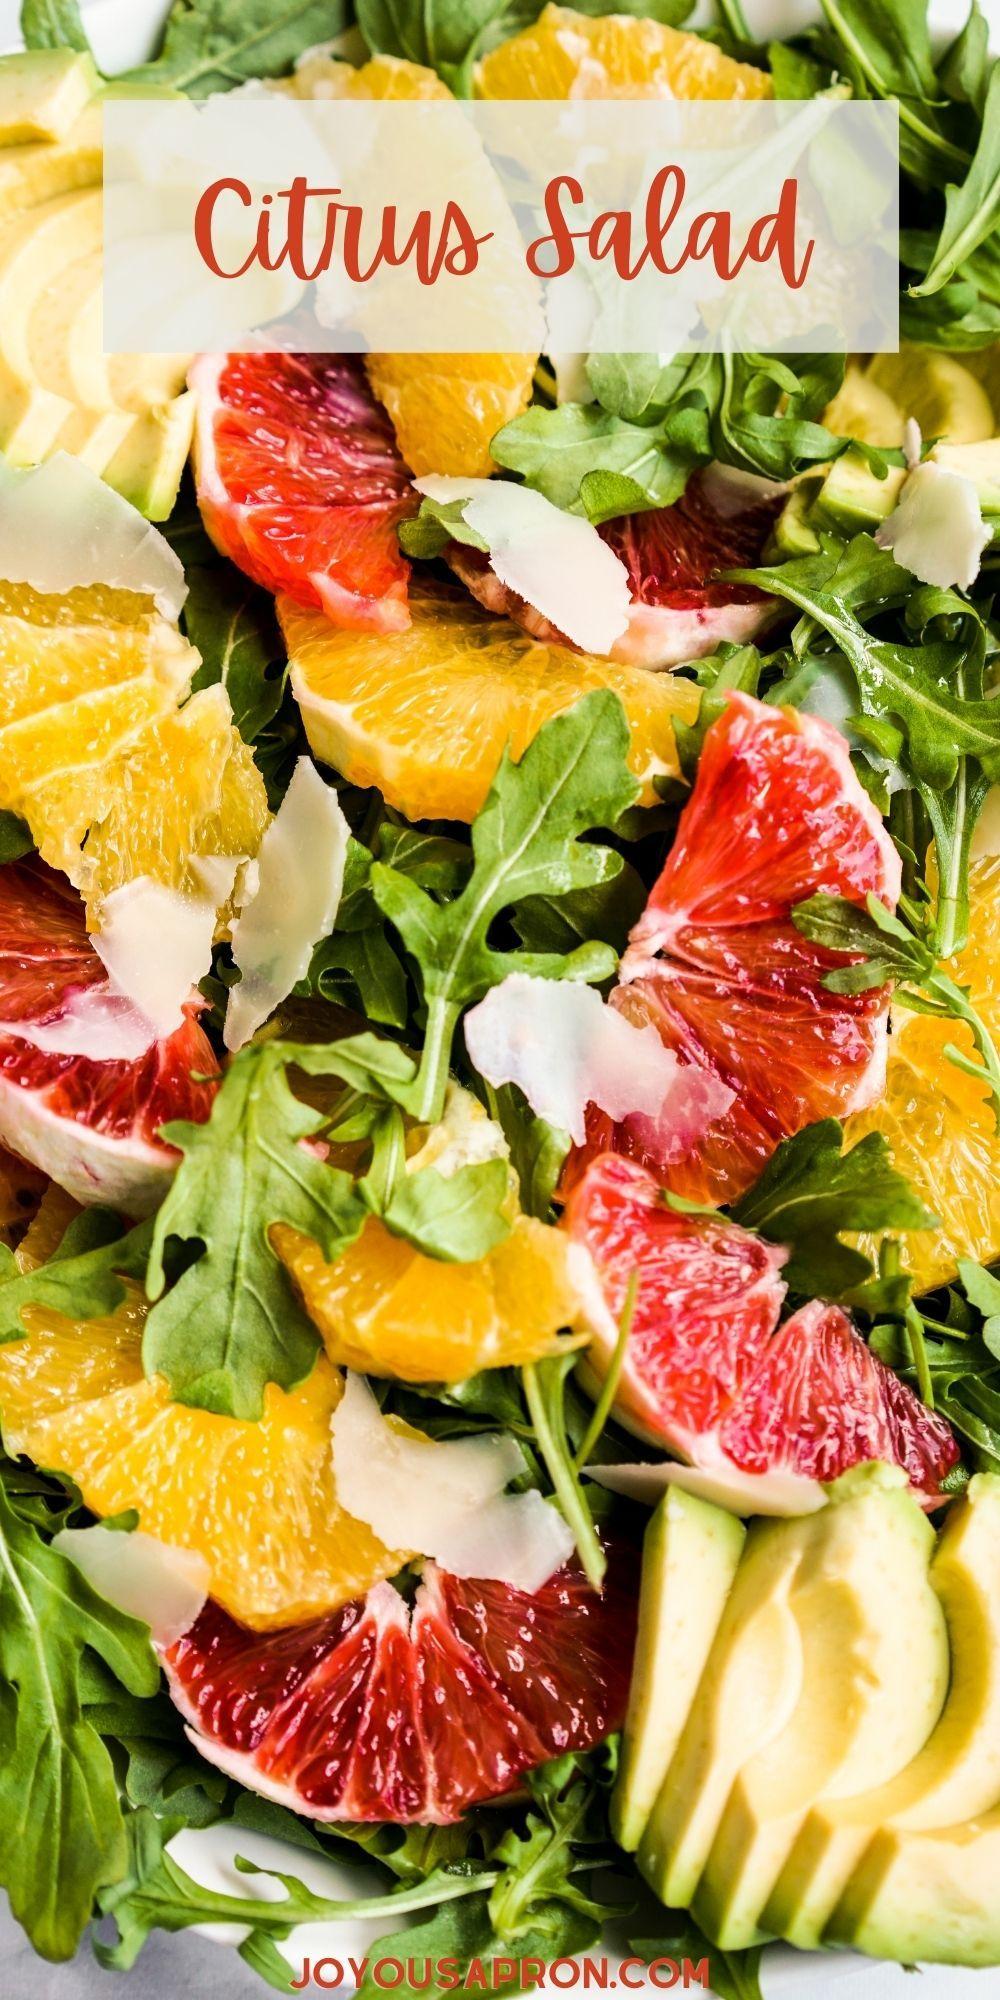 Avocado Orange Salad Avocado Citrus Salad Joyous Apron Recipe In 2021 Citrus Salad Recipes Orange Salad Recipes Citrus Salad